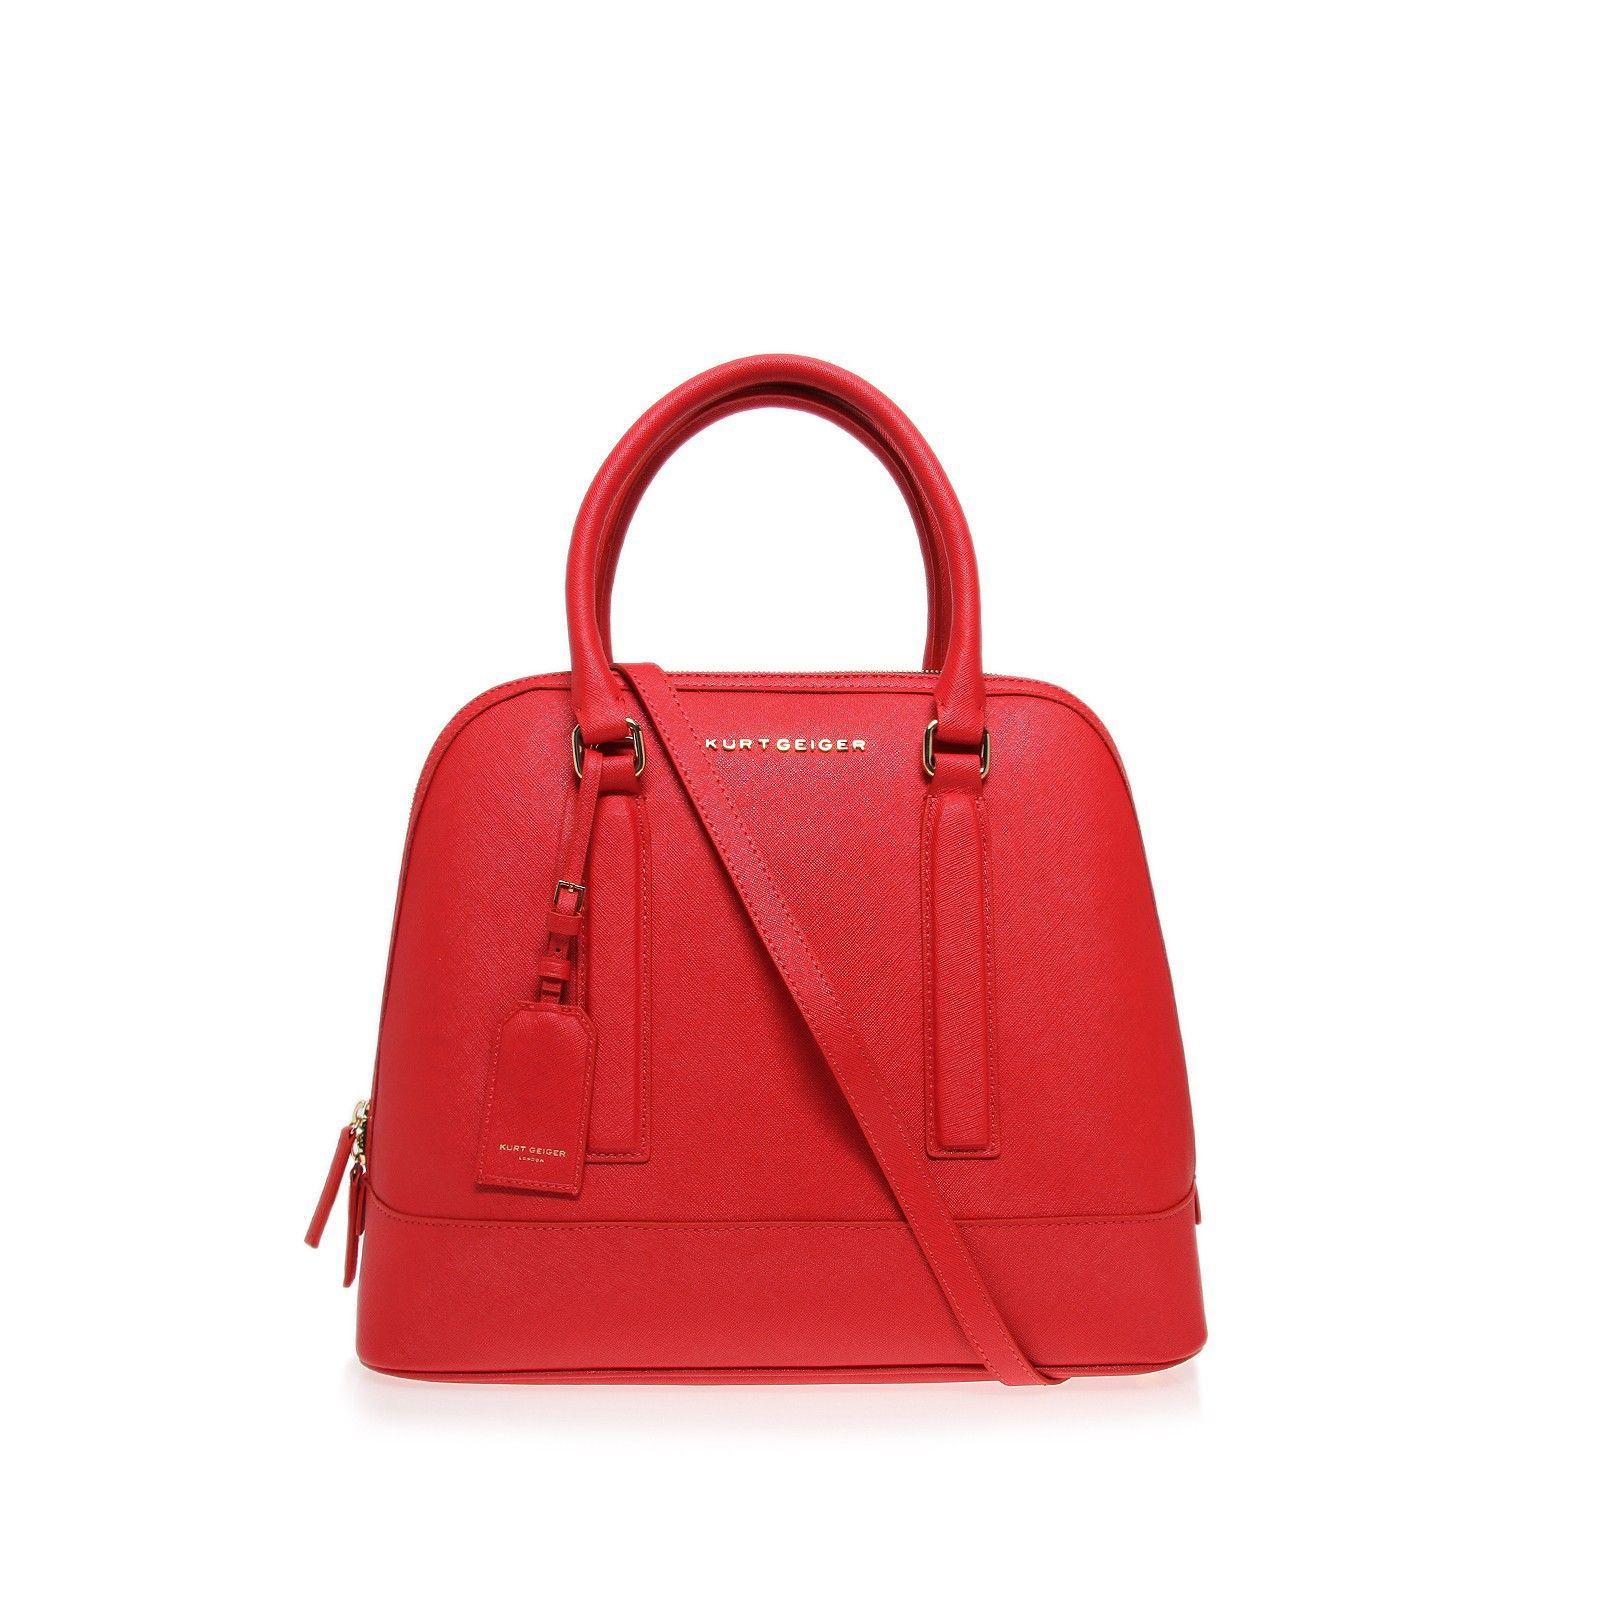 saffiano tall bowling bag, red accessory by kurt geiger london ...